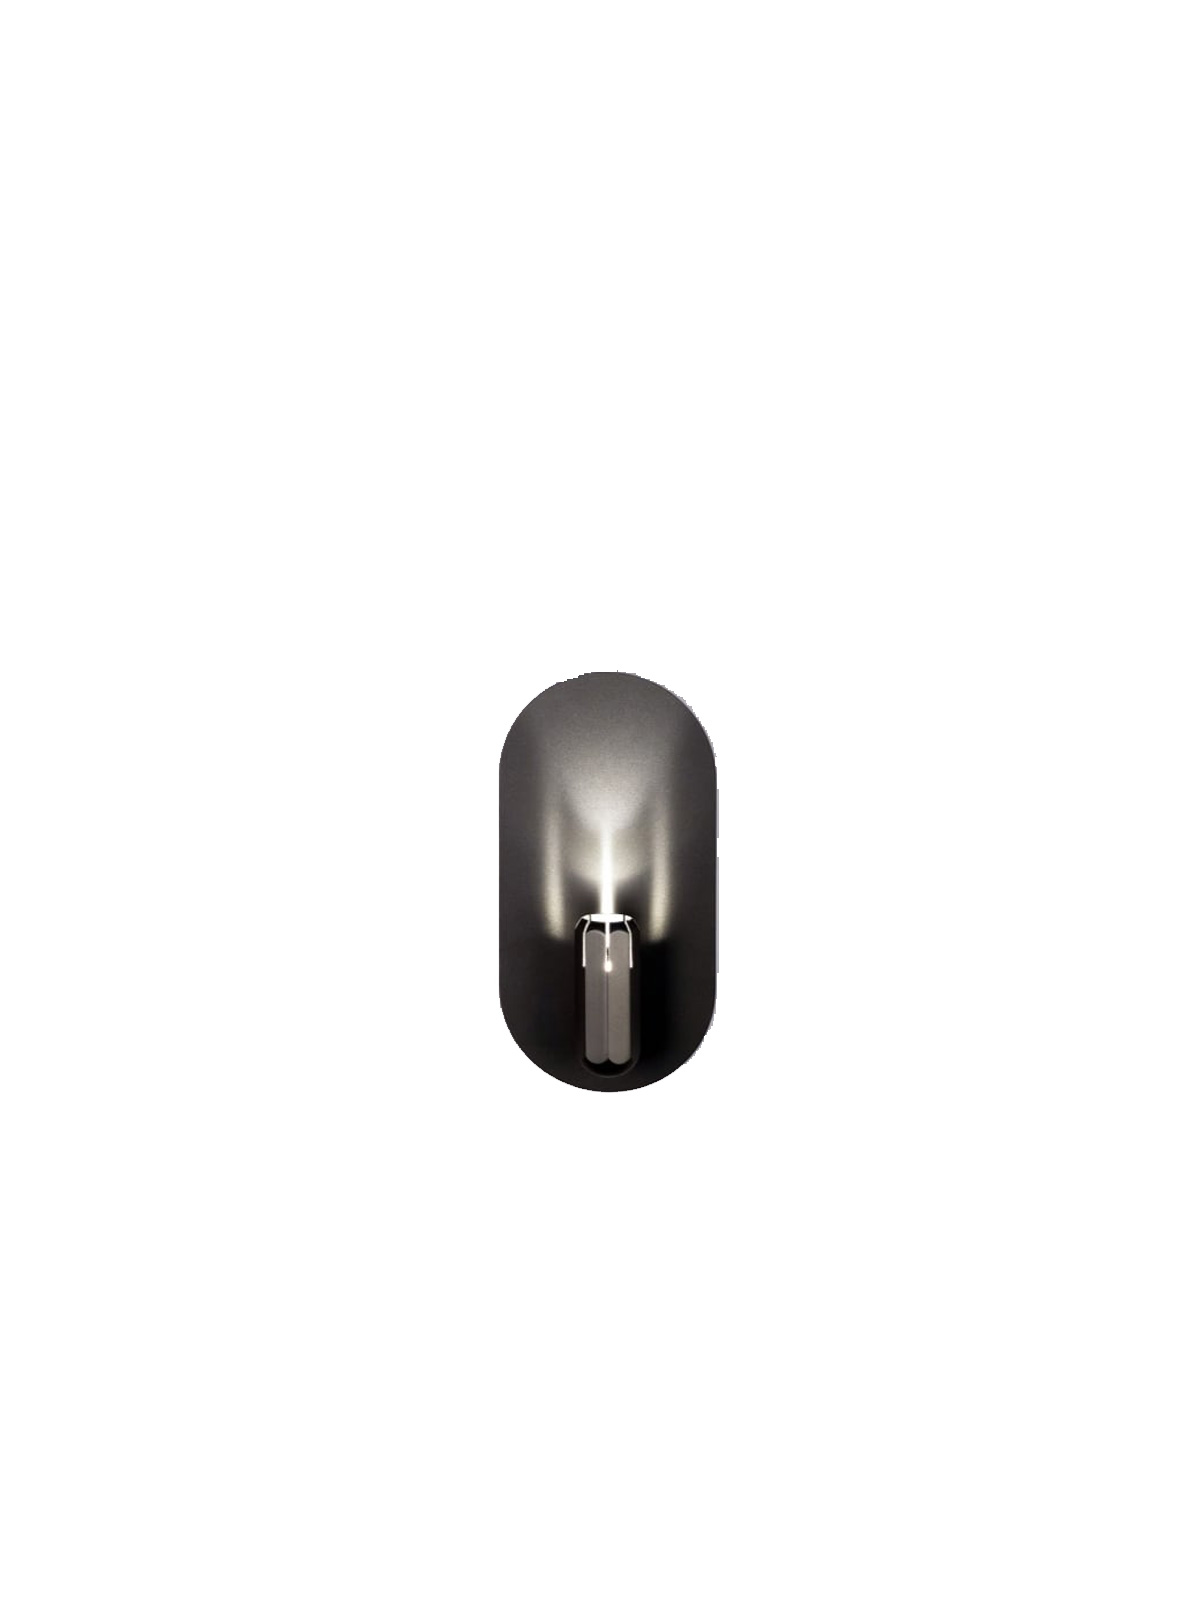 LED Wandlampe Brixton Wall aus Aluminium von Innermost Uplight